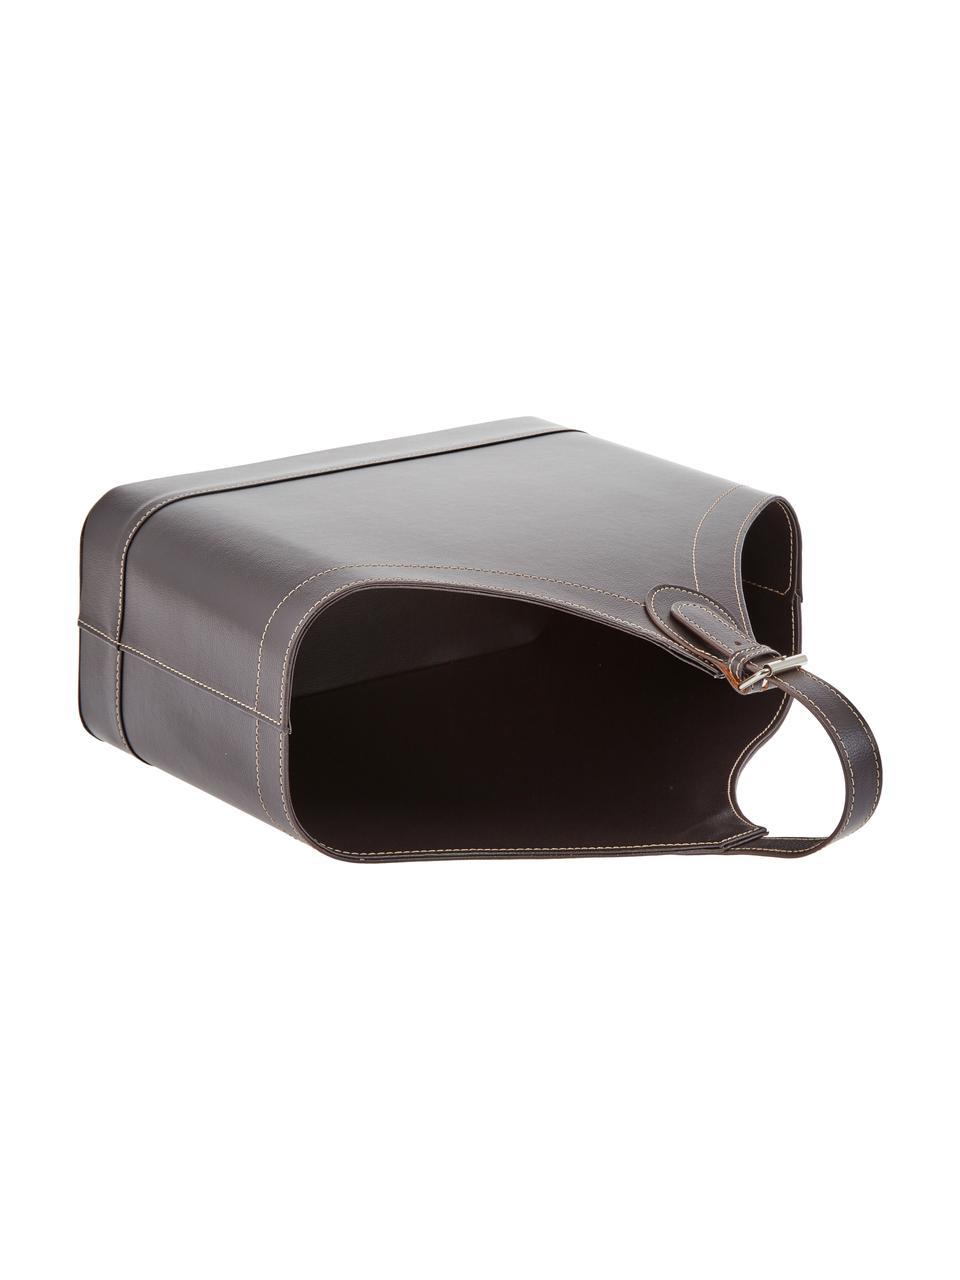 Portariviste Ready, Struttura: cartone, Rivestimento: poliuretano, Portariviste: marrone Cuciture: beige Involucro: metallo, Larg. 40 x Alt. 45 cm